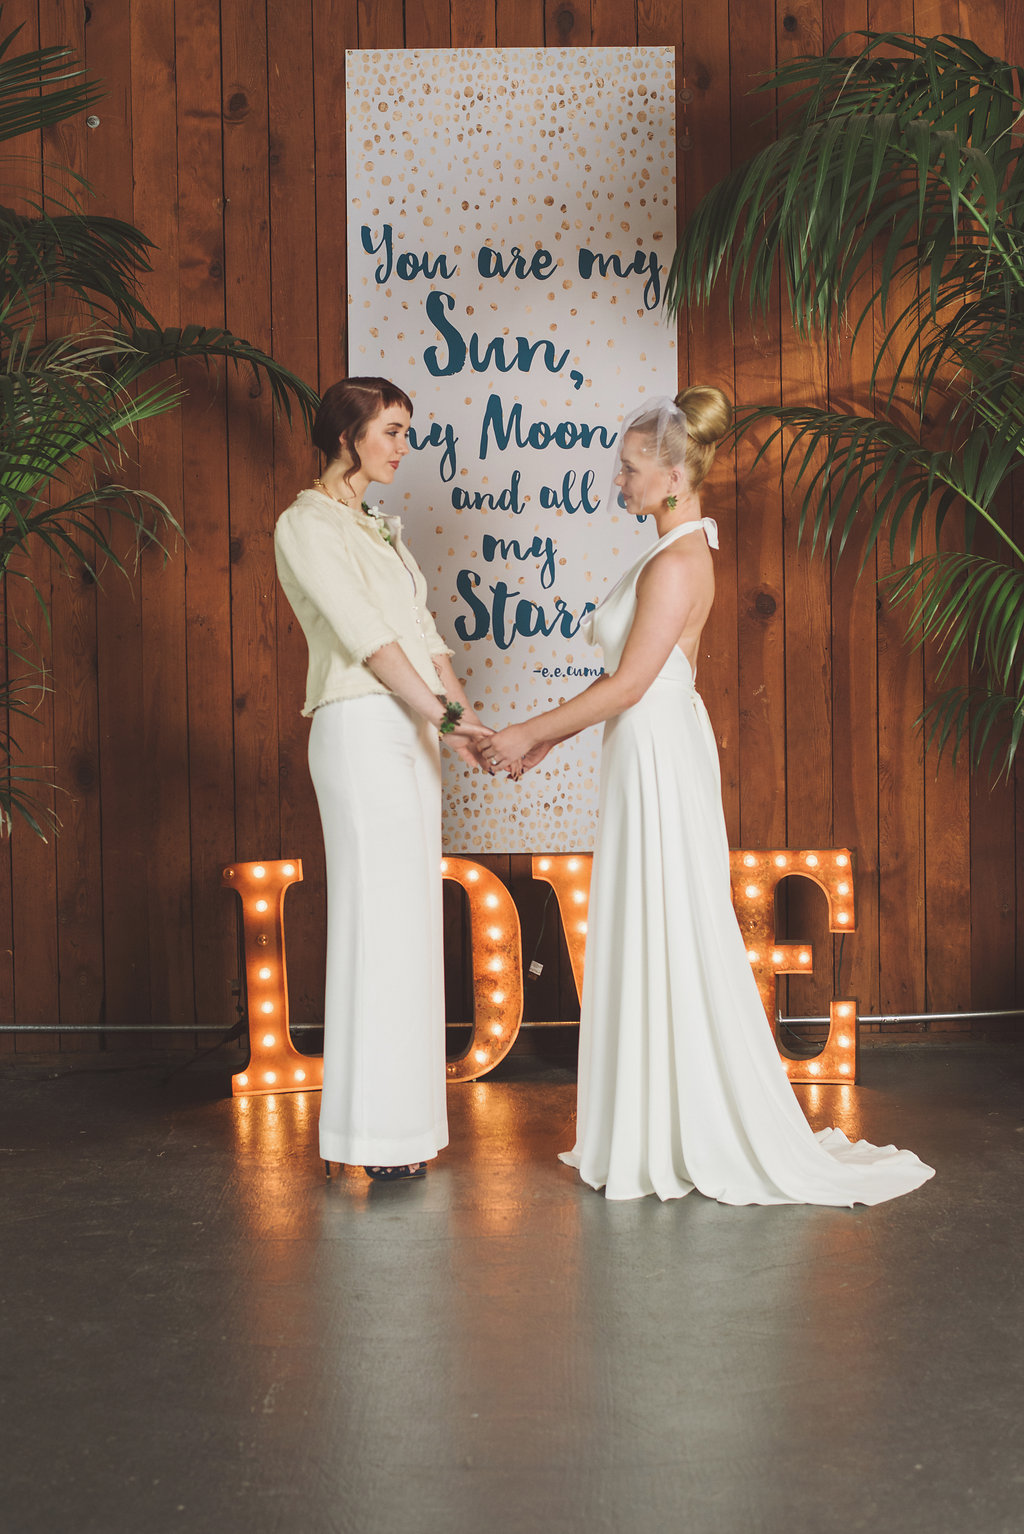 Lesbian wedding ceremony design by Vases Wild